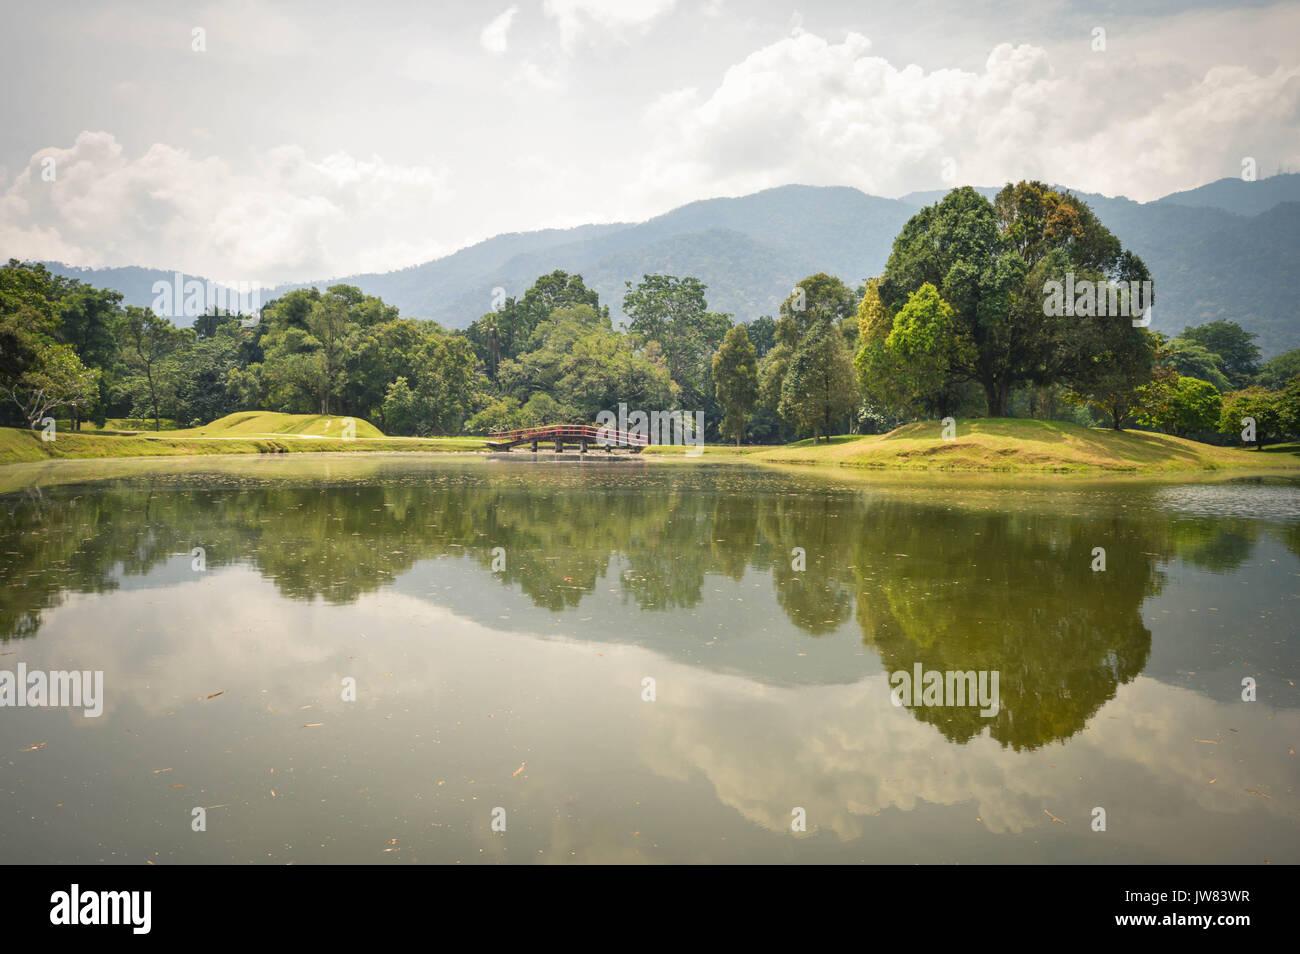 Beautiful landscape of water reflections in Taman Tasik, aka Lake Gardens, in the city of Taiping, Perak State, Malaysia - Stock Image